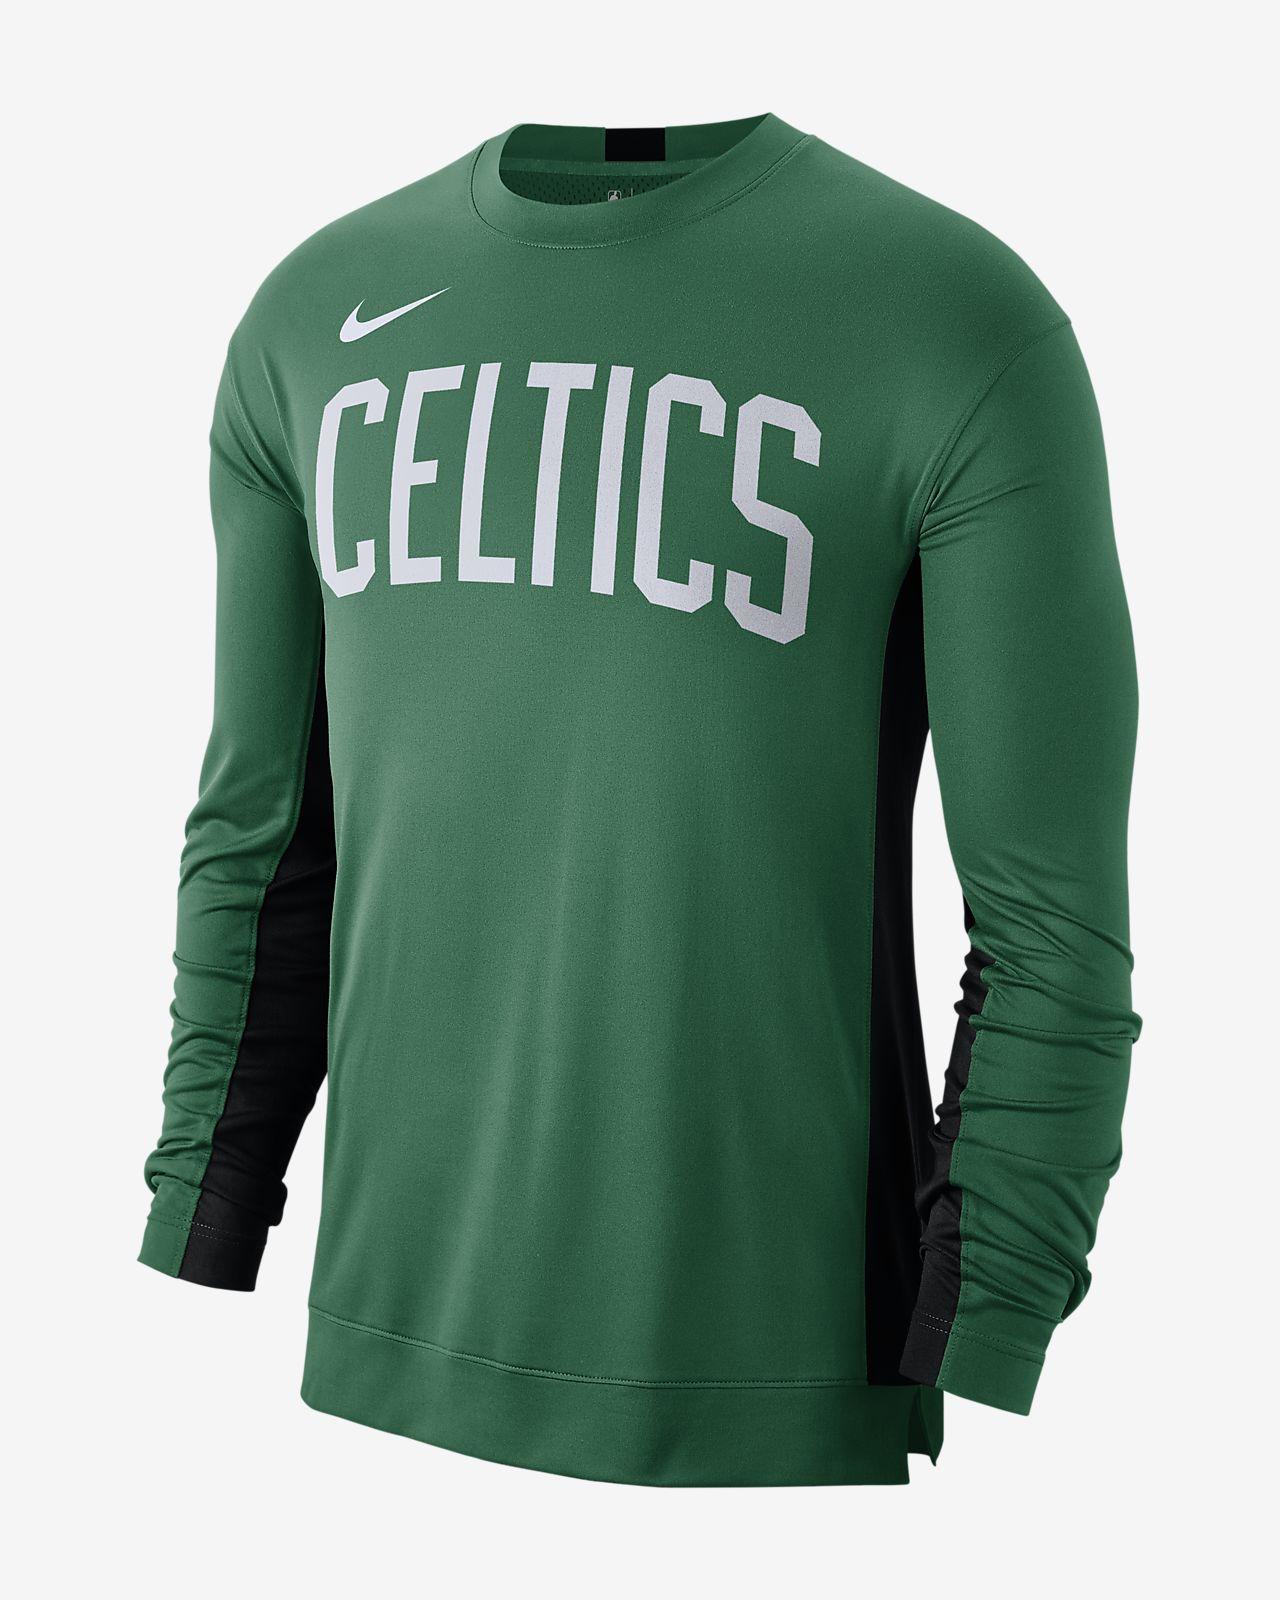 Playera para prácticas de la NBA para hombre Boston Celtics Nike Dri-FIT